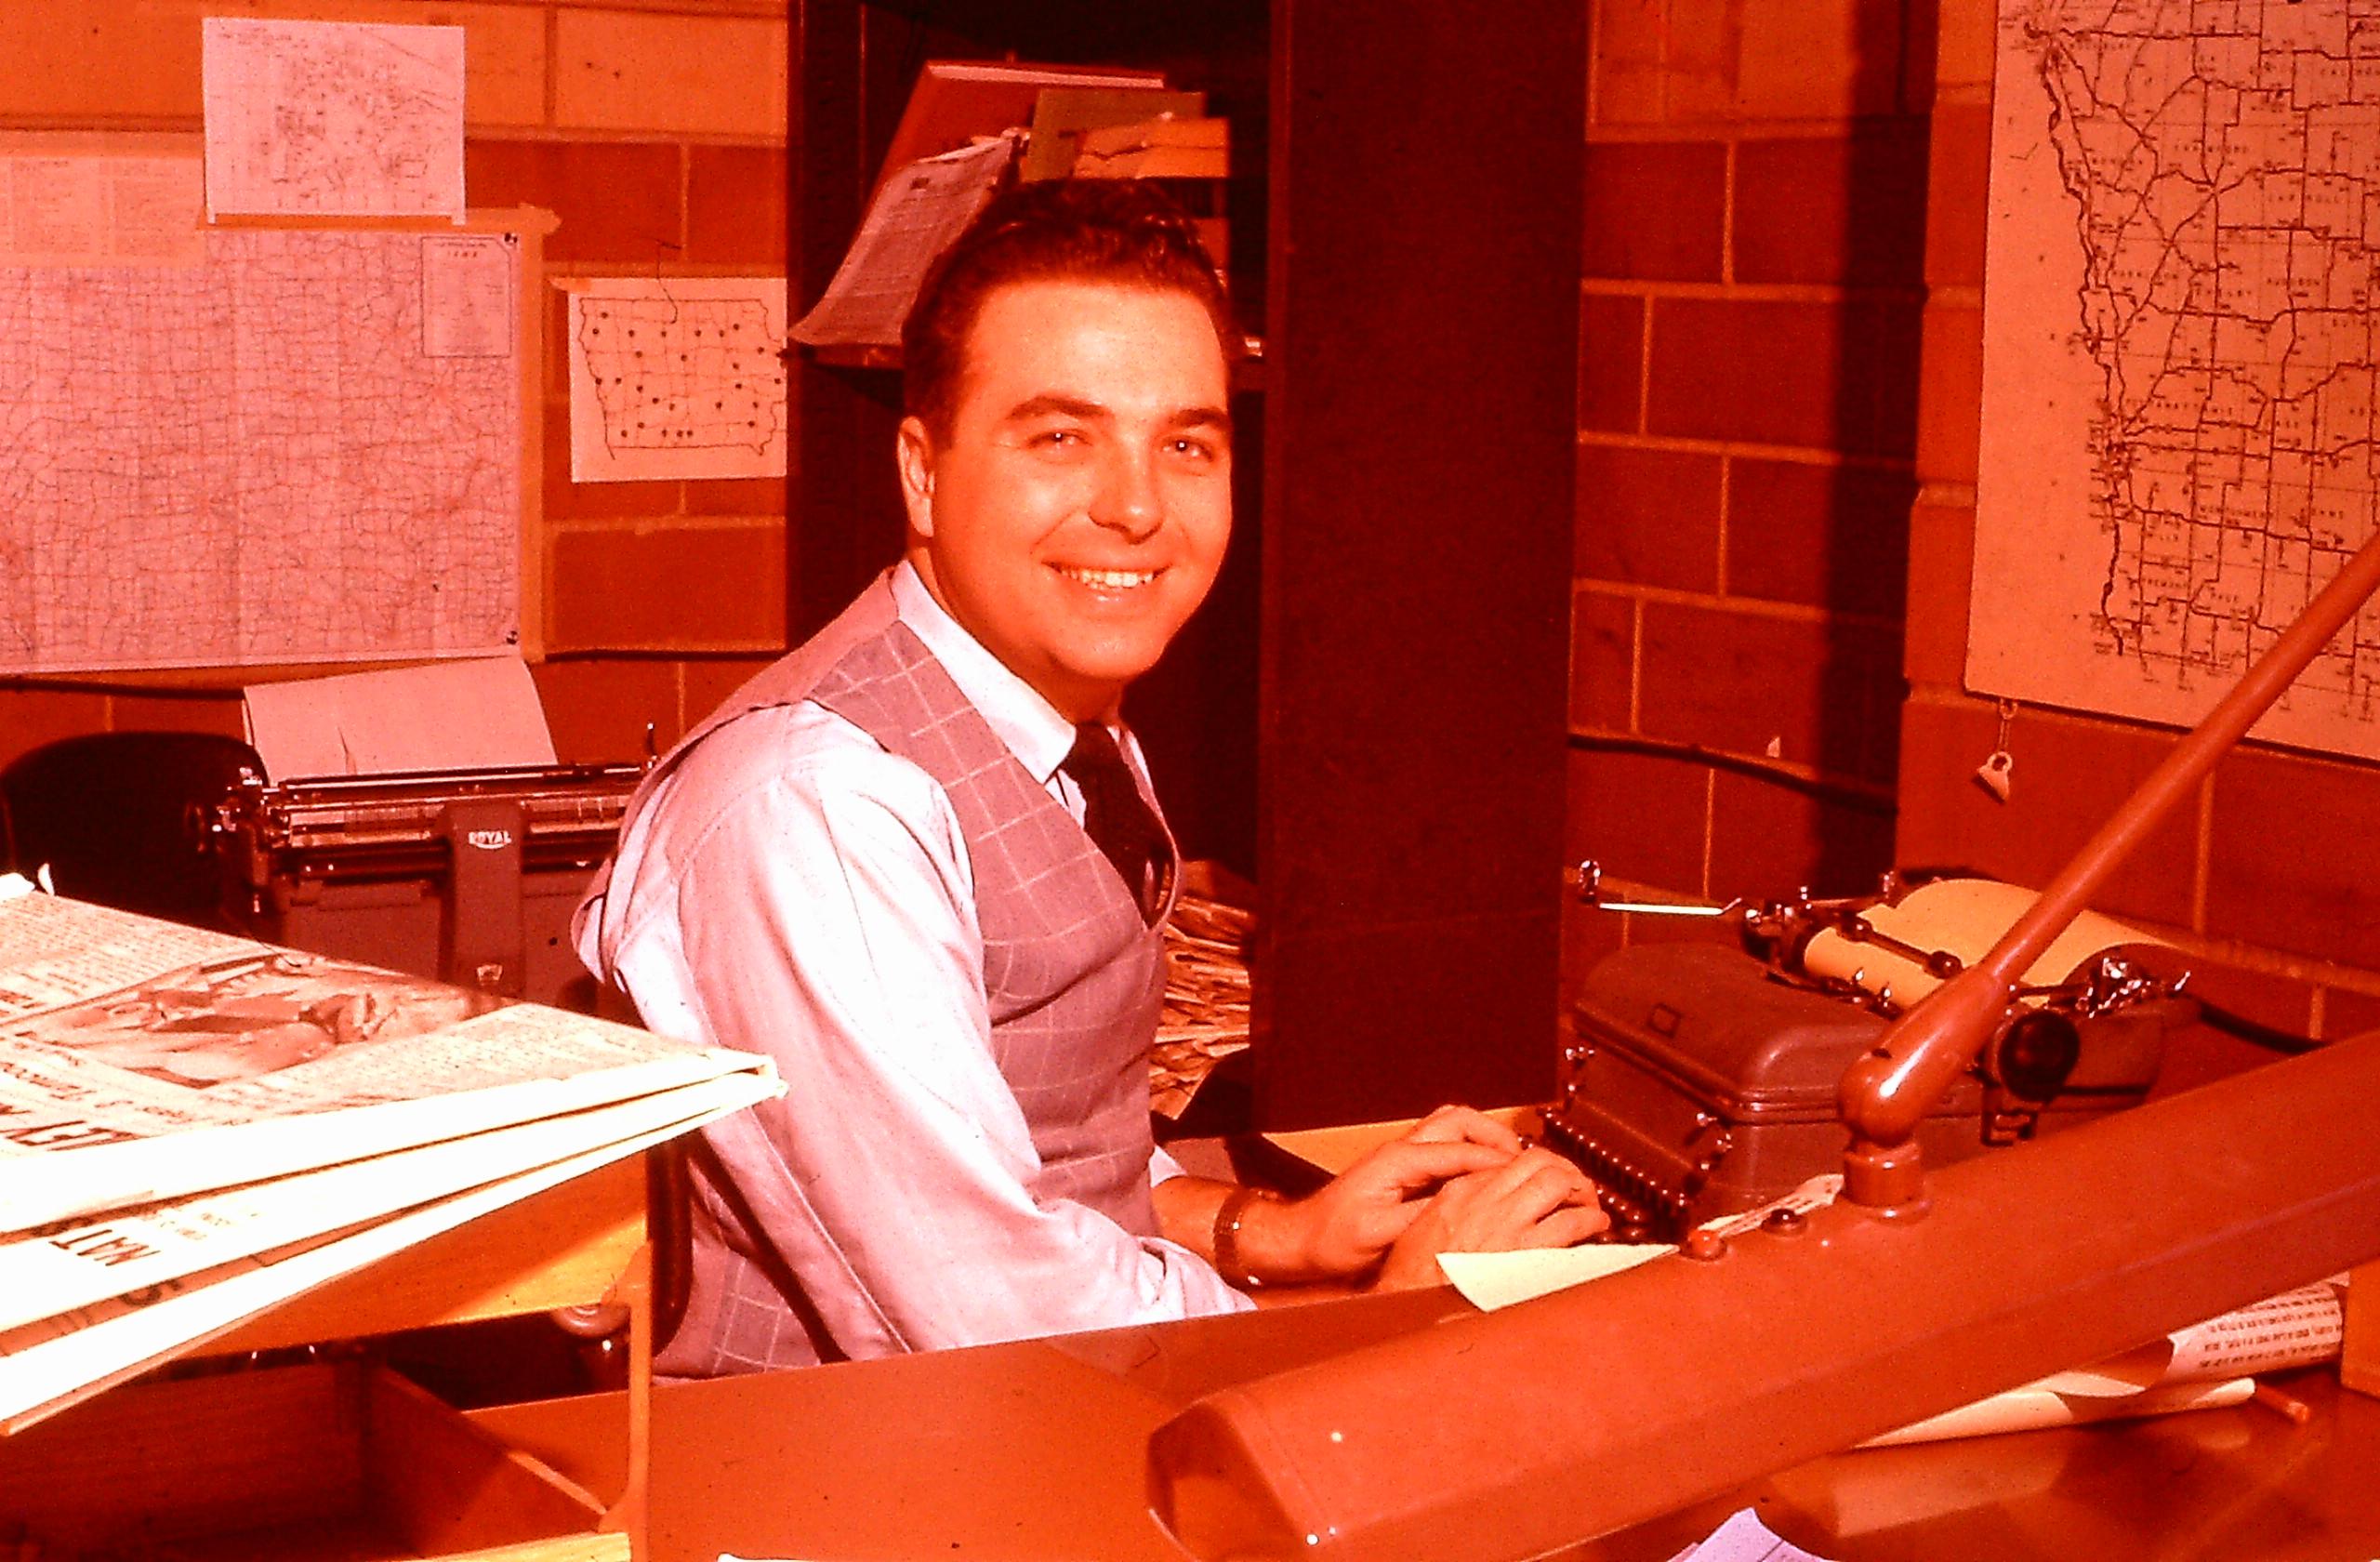 Ray Nelson at typewriter at Medill.